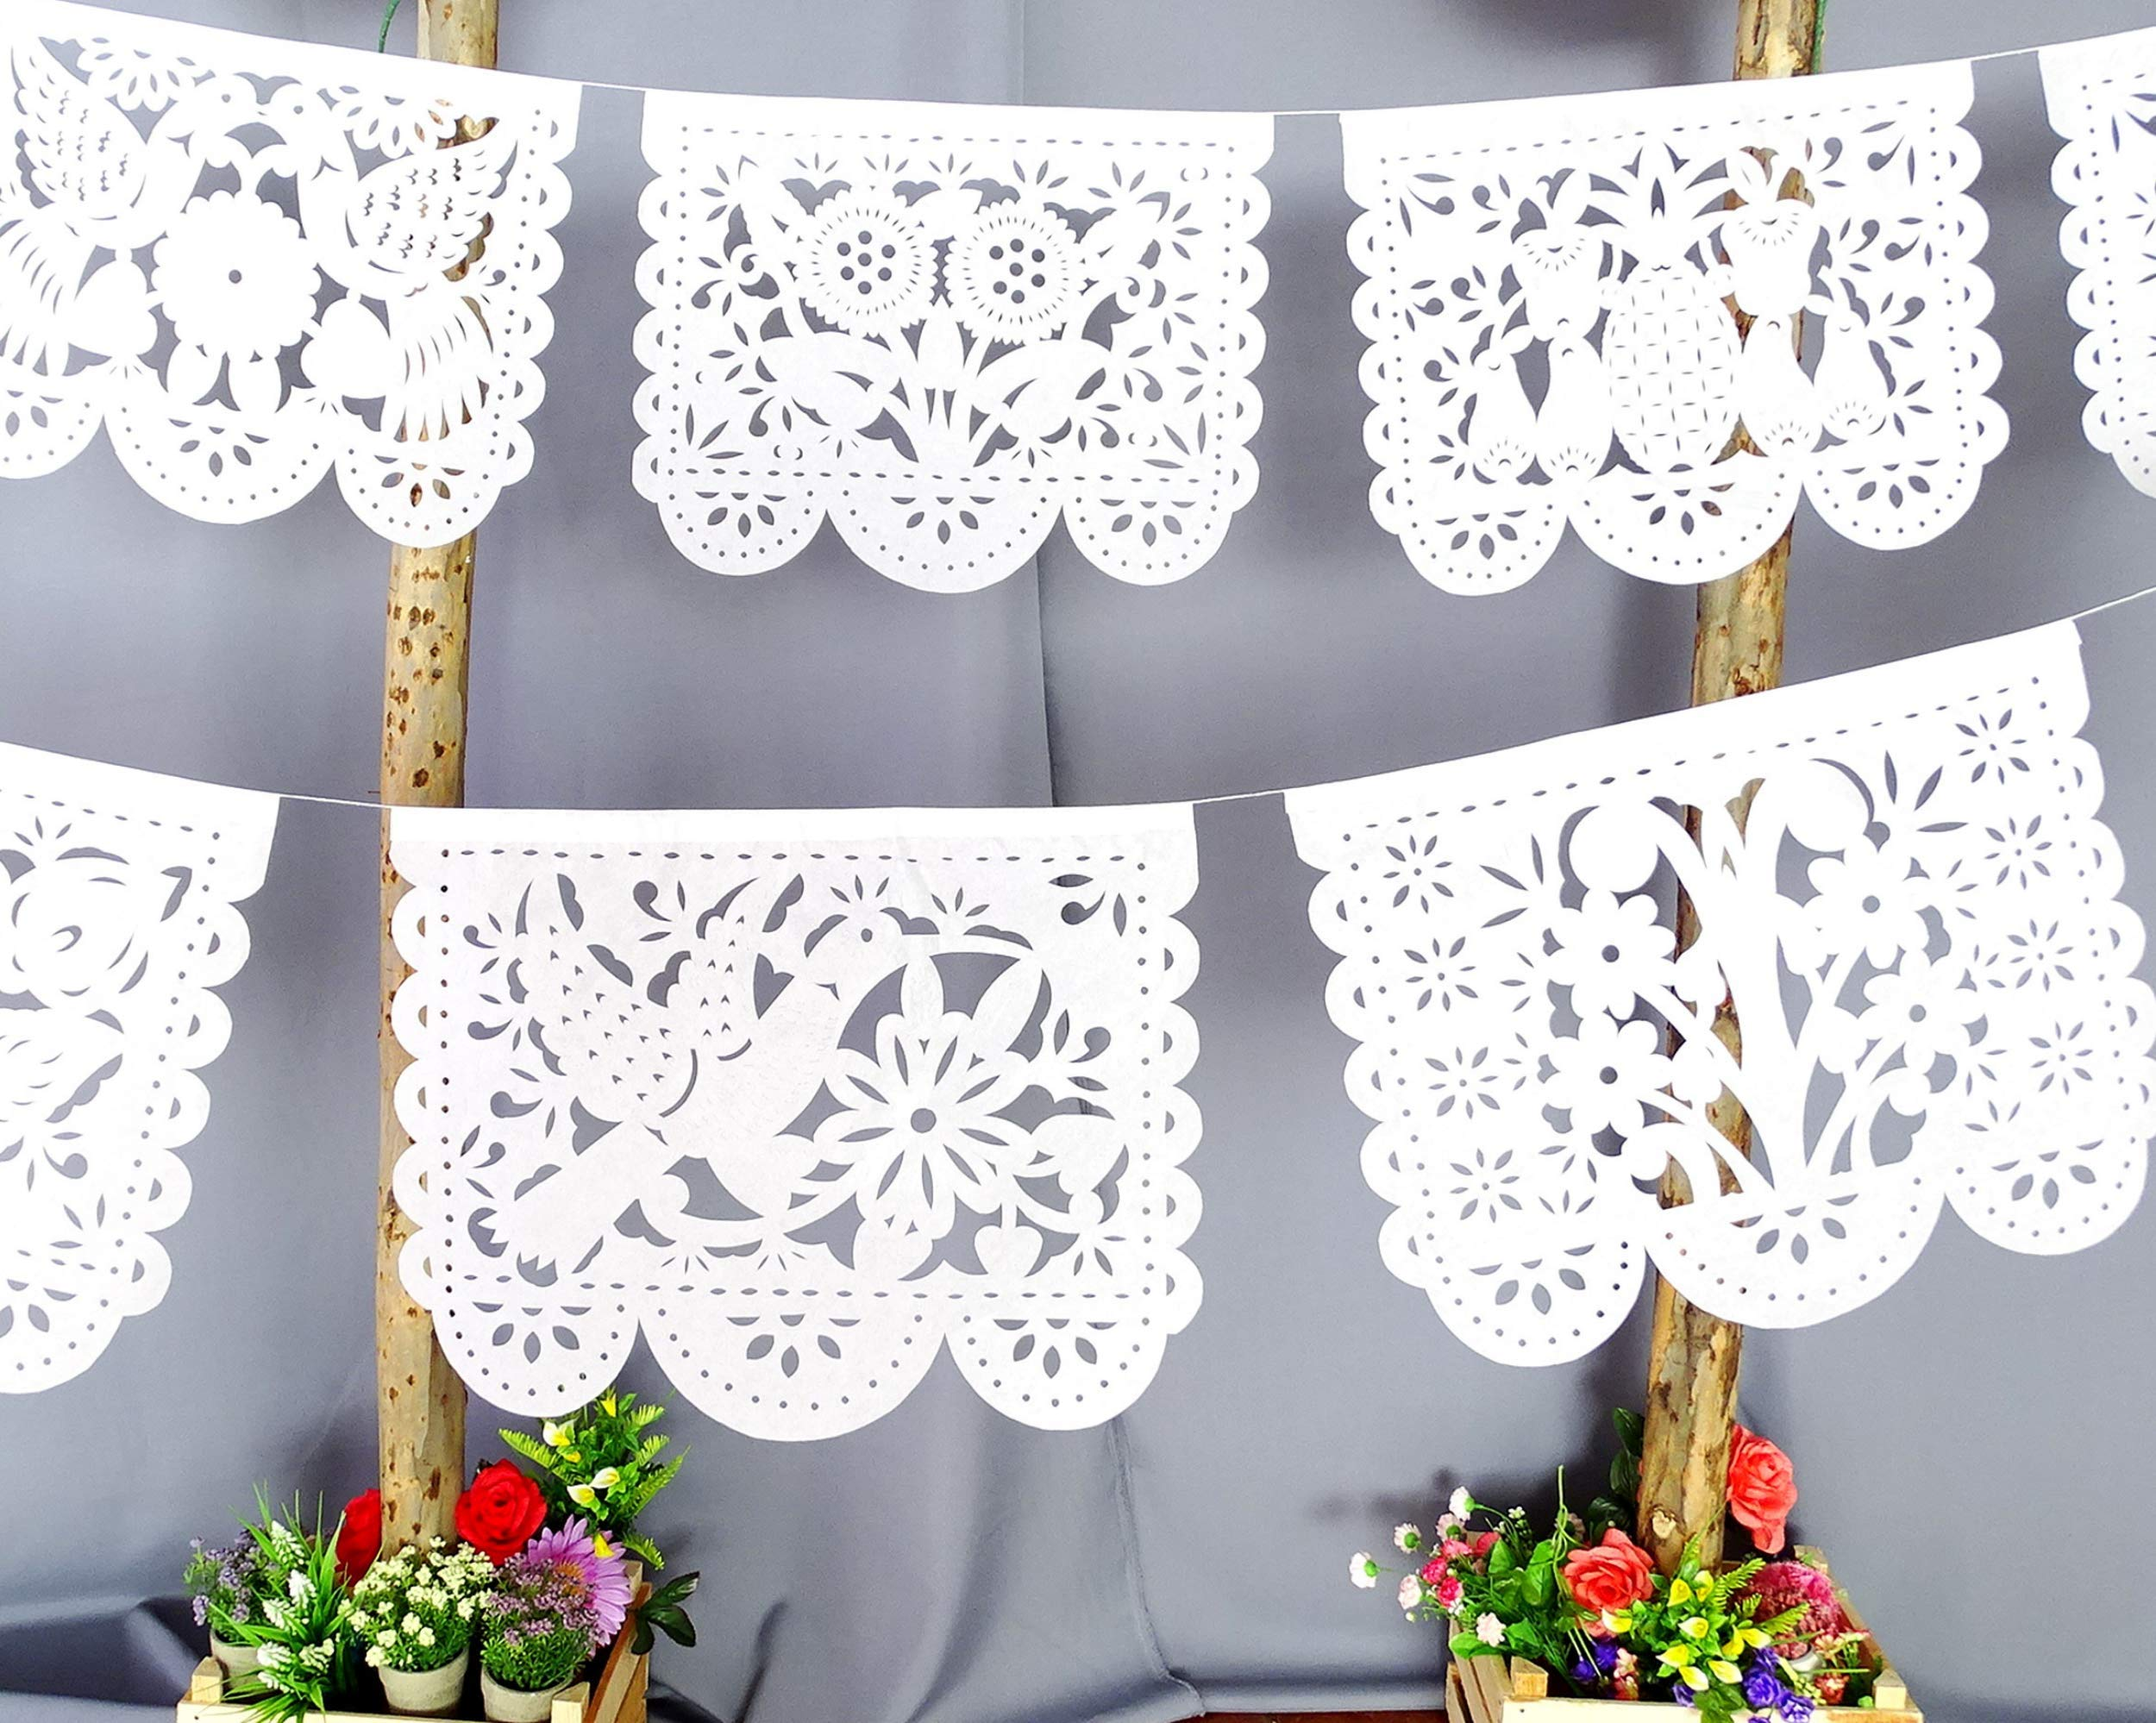 Mexican Party Decorations, 5 Pk White Papel Picado Over 83 Feet Long, for Weddings, quinceañeras, Birthdays, Fiesta Party Supplies, Boda decoración, Banner Paper 50 Flags WS93